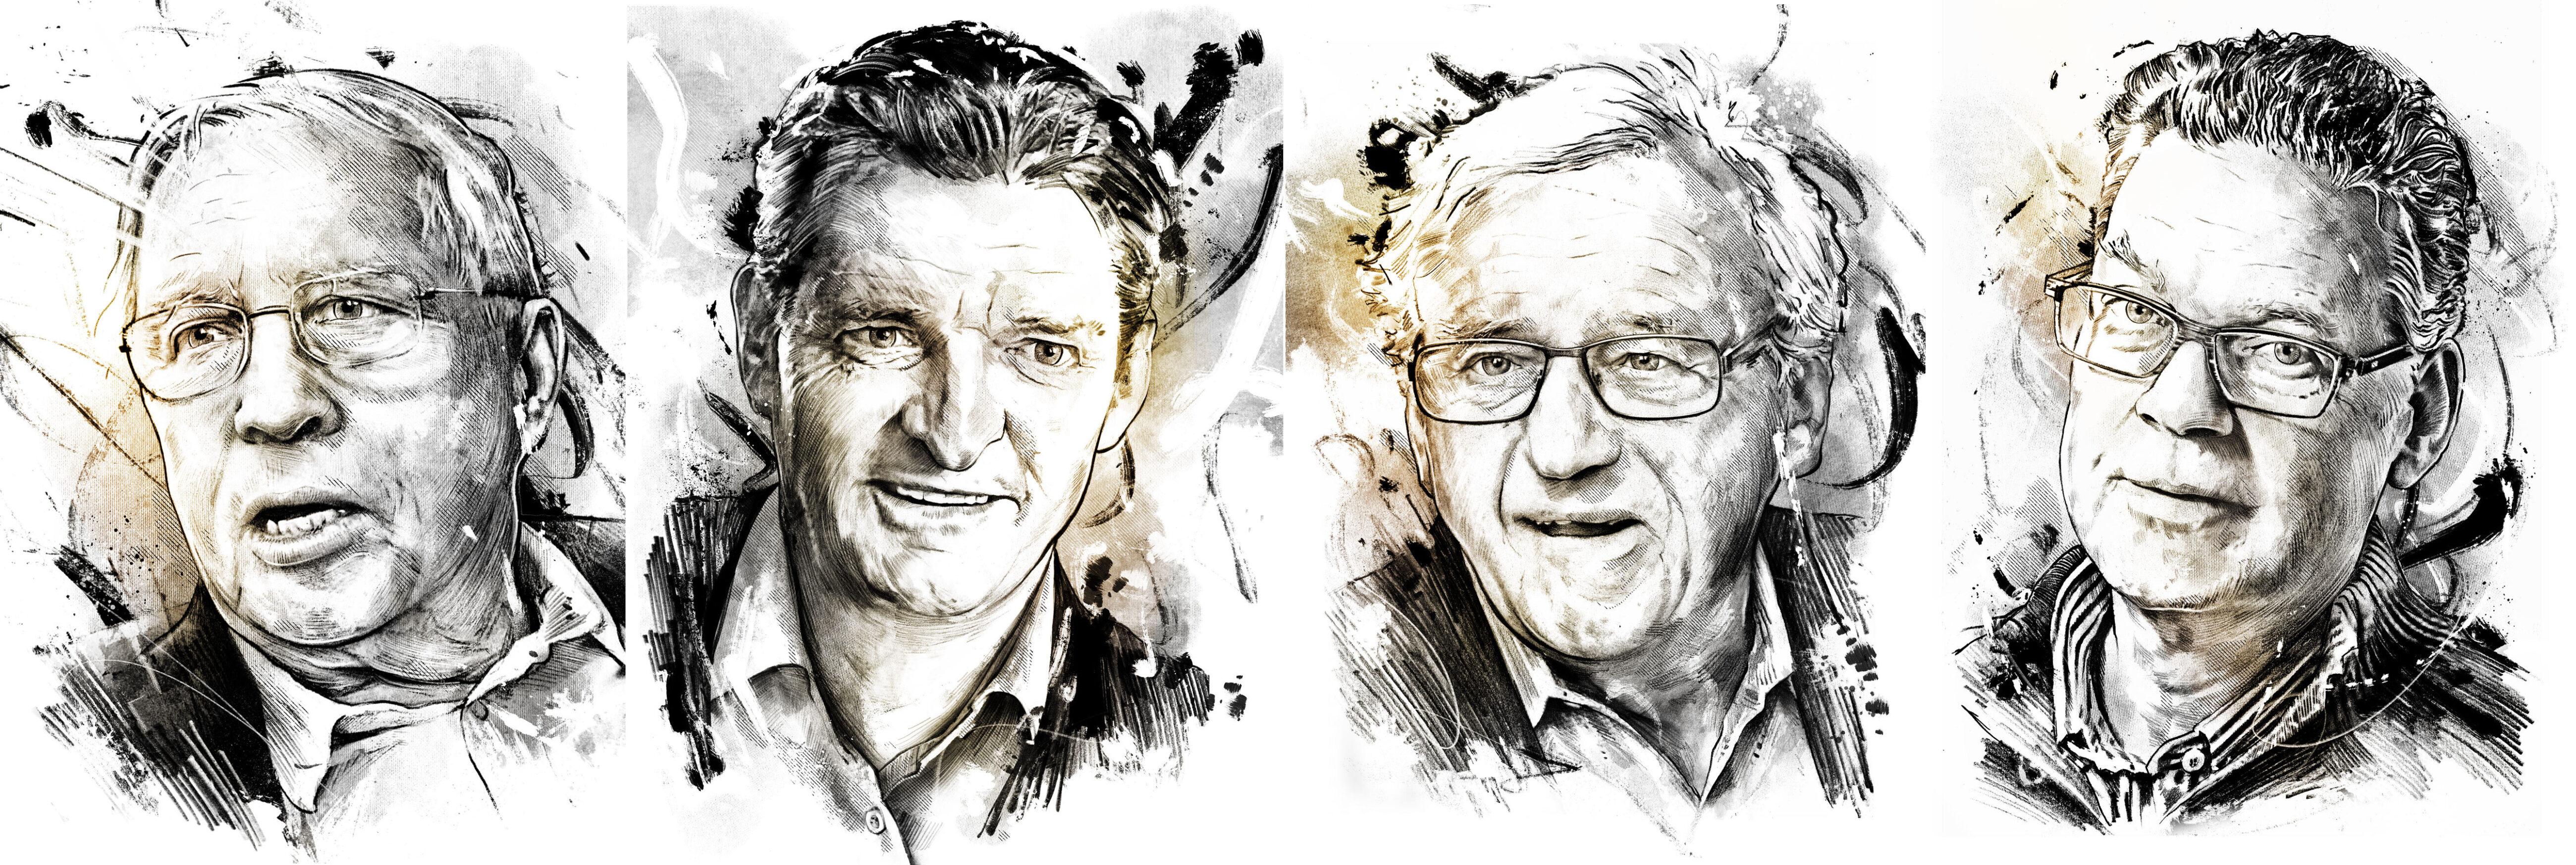 Portraits portrait illustration editorial portraitdrawing - Kornel Illustration | Kornel Stadler portfolio